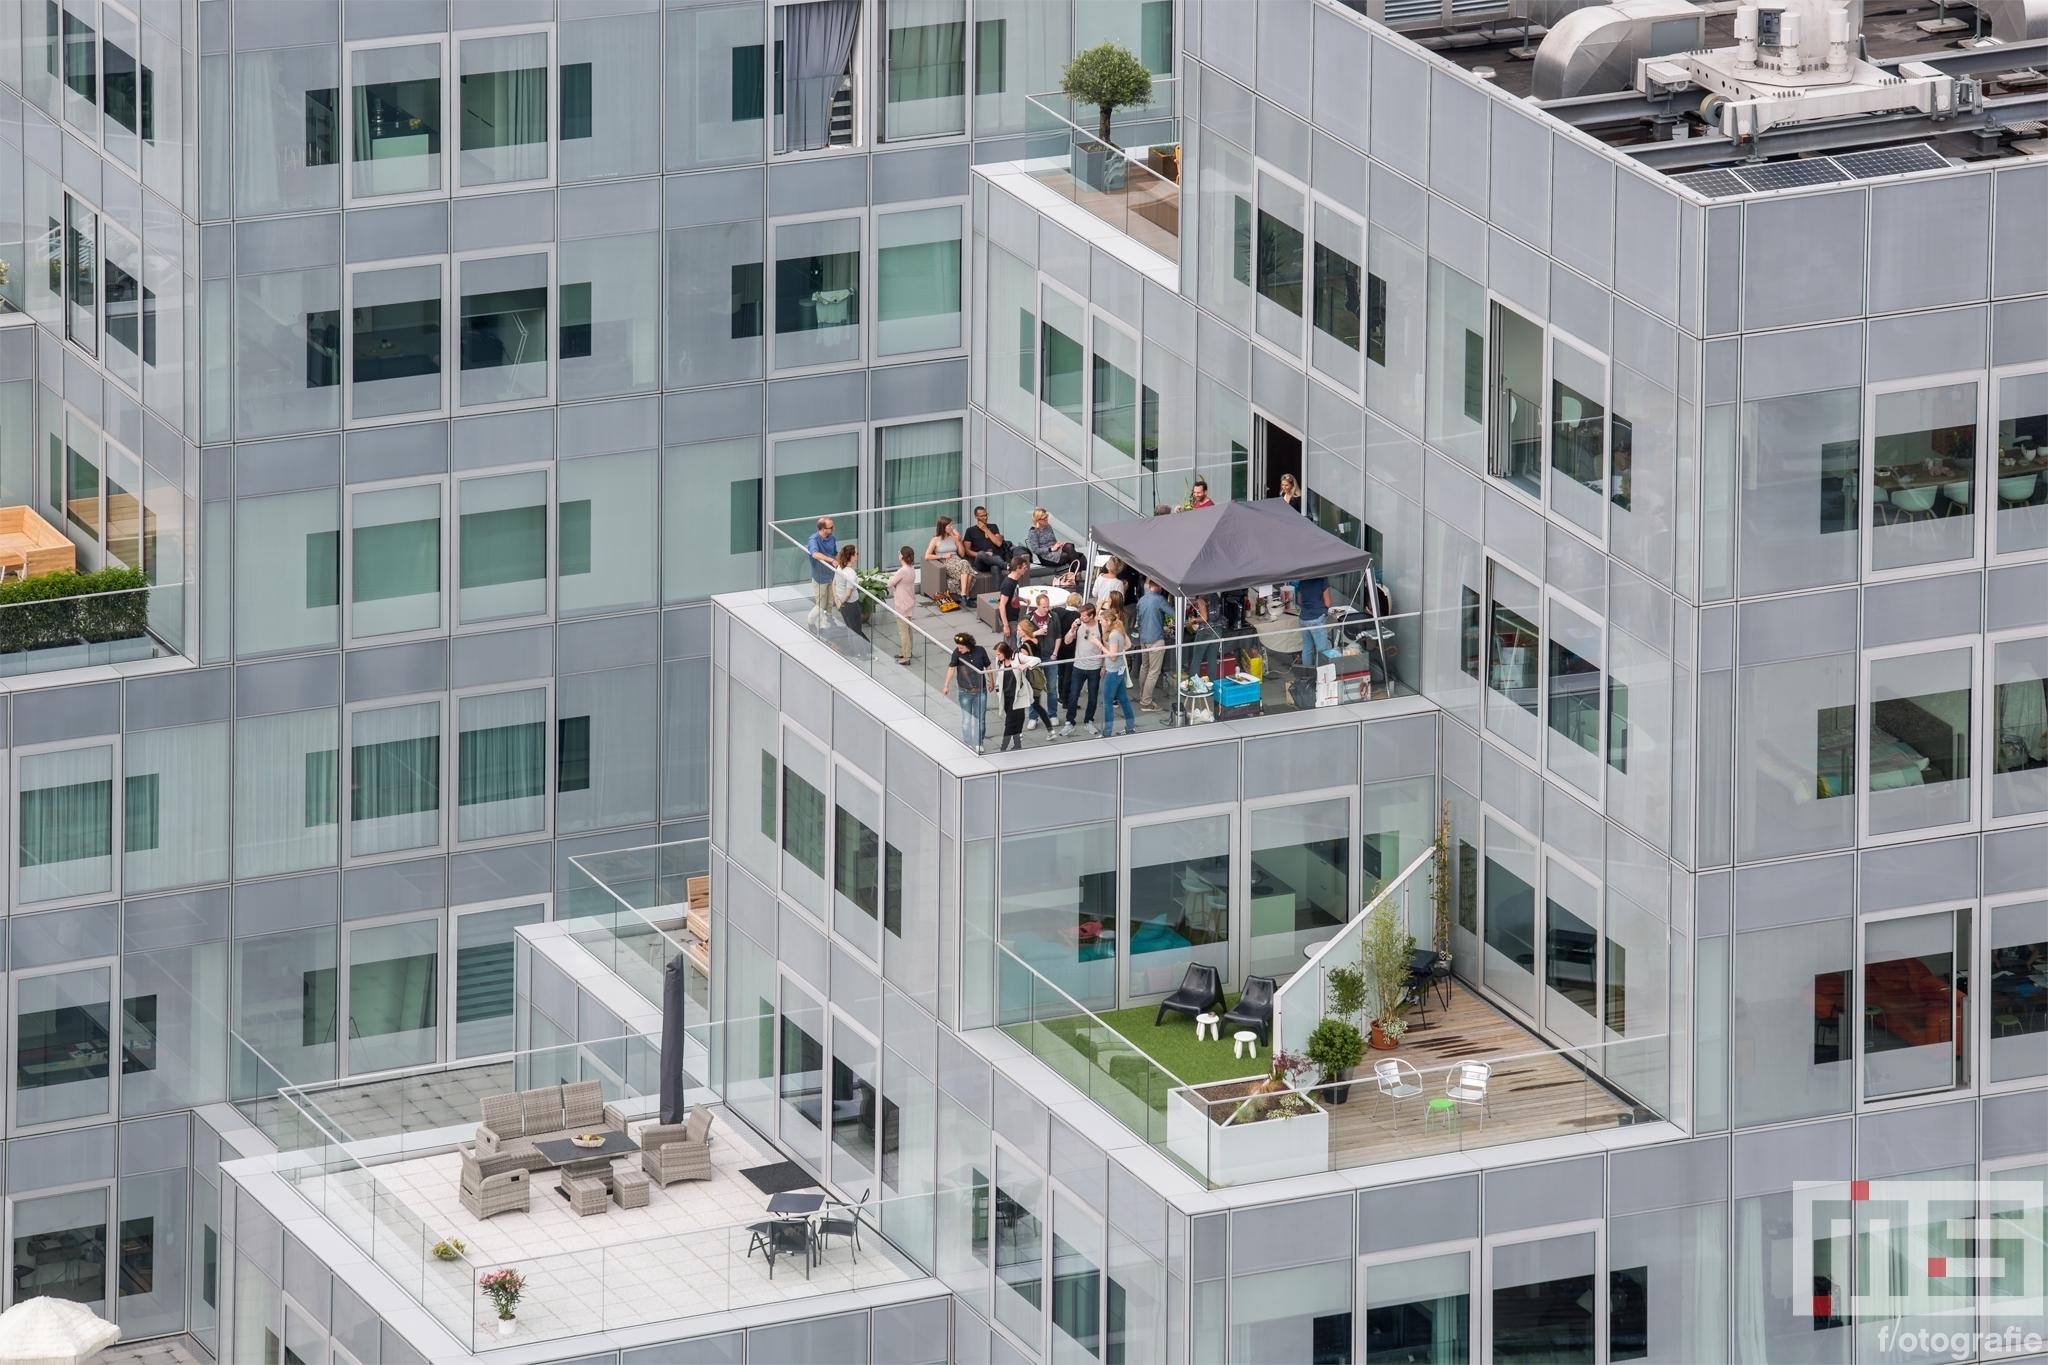 Het Timmerhuis van Rem Koolhaas in Rotterdam Centrum